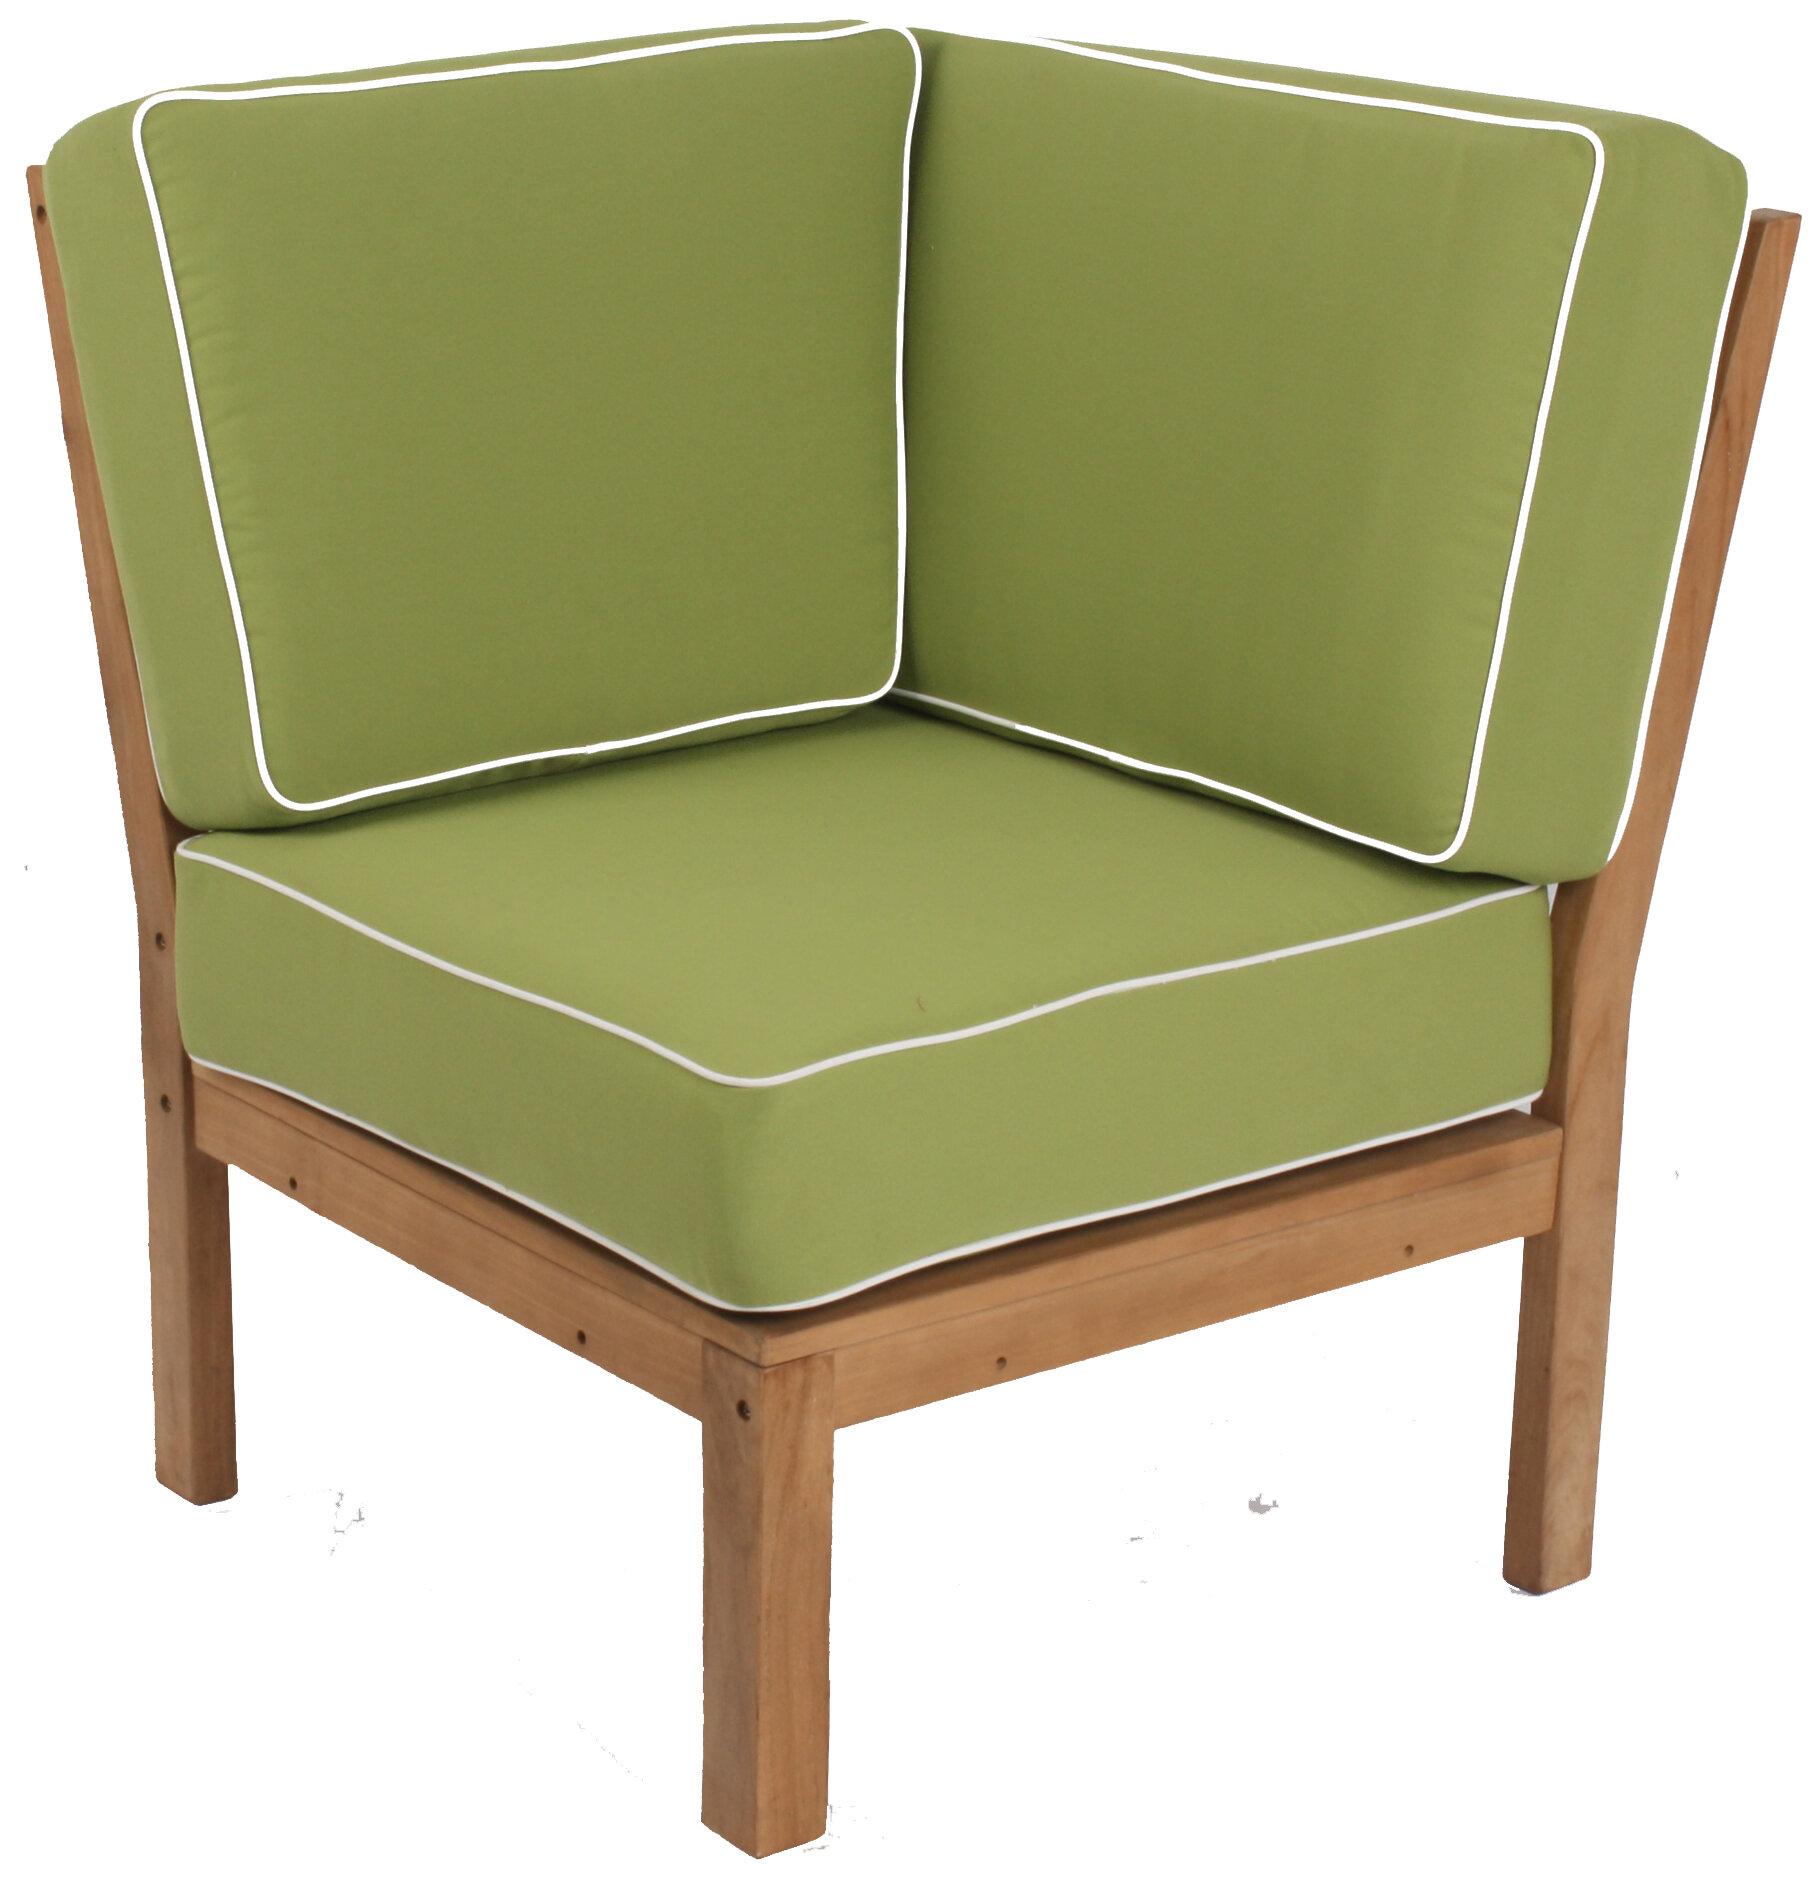 Cambridge Casual Kensington Teak Patio Chair With Cushions Wayfair